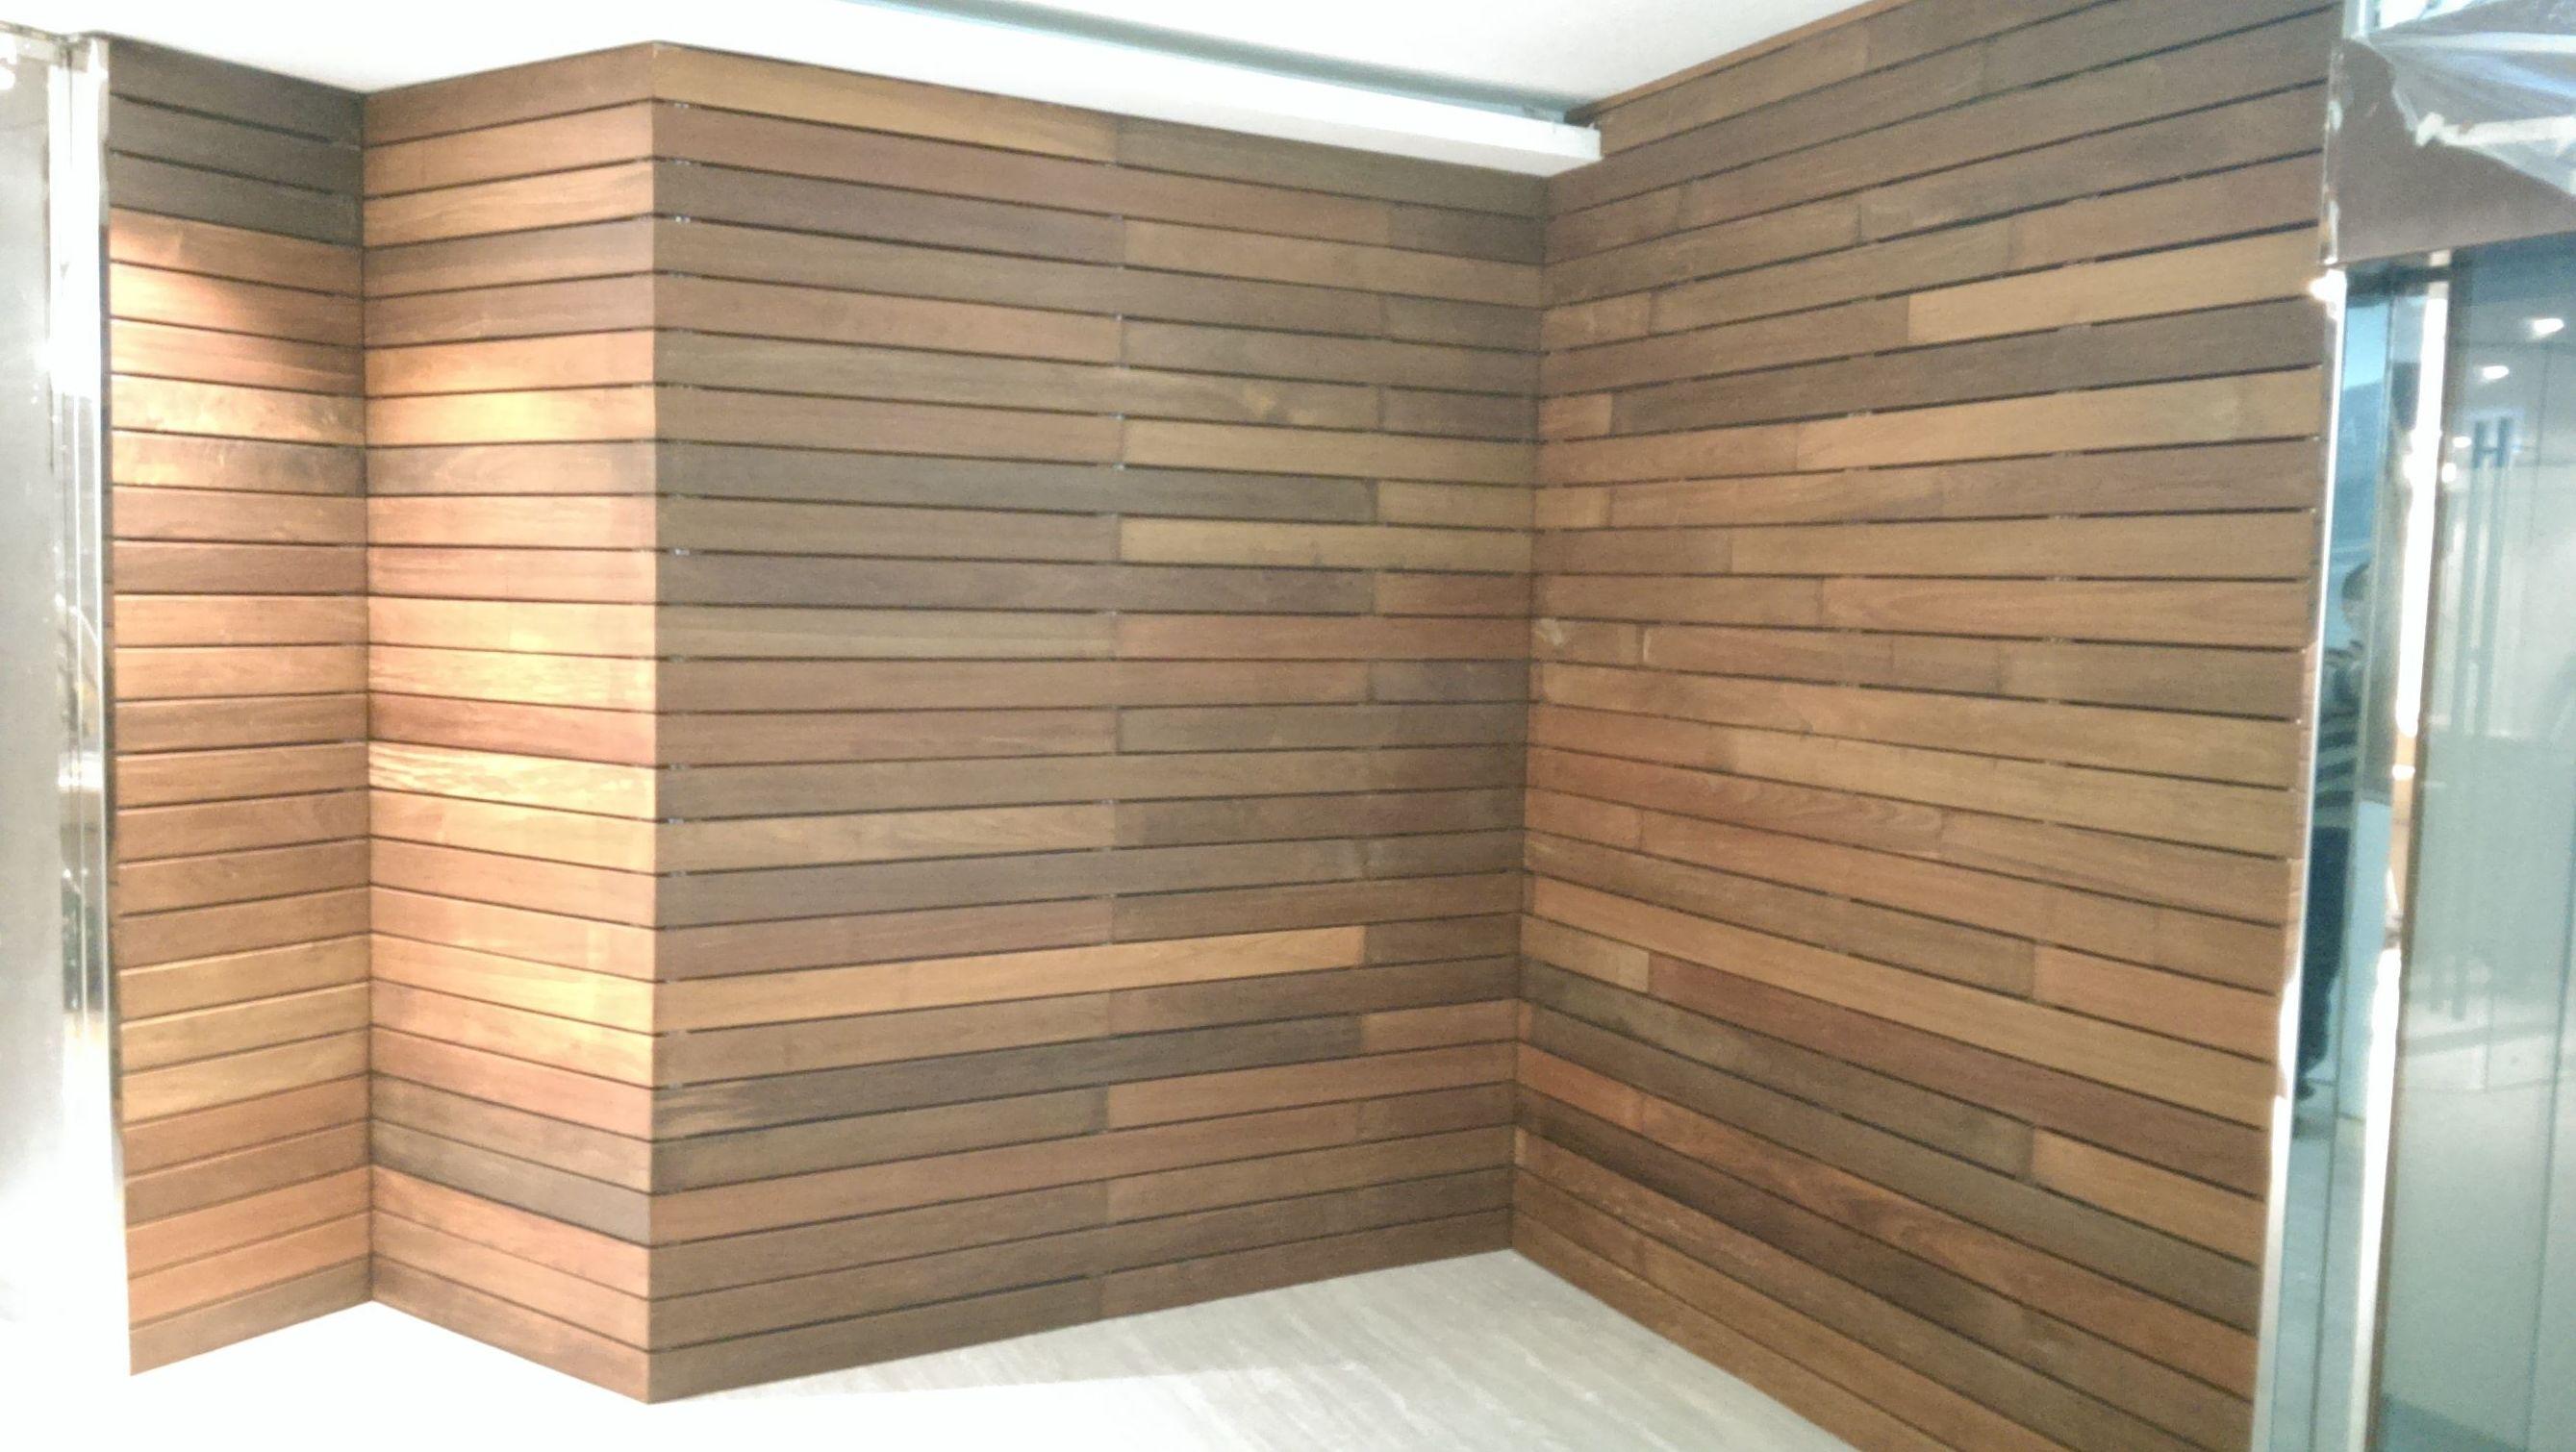 Tarimas de exterior en madera de ipe composite tecnologica - Madera de ipe ...